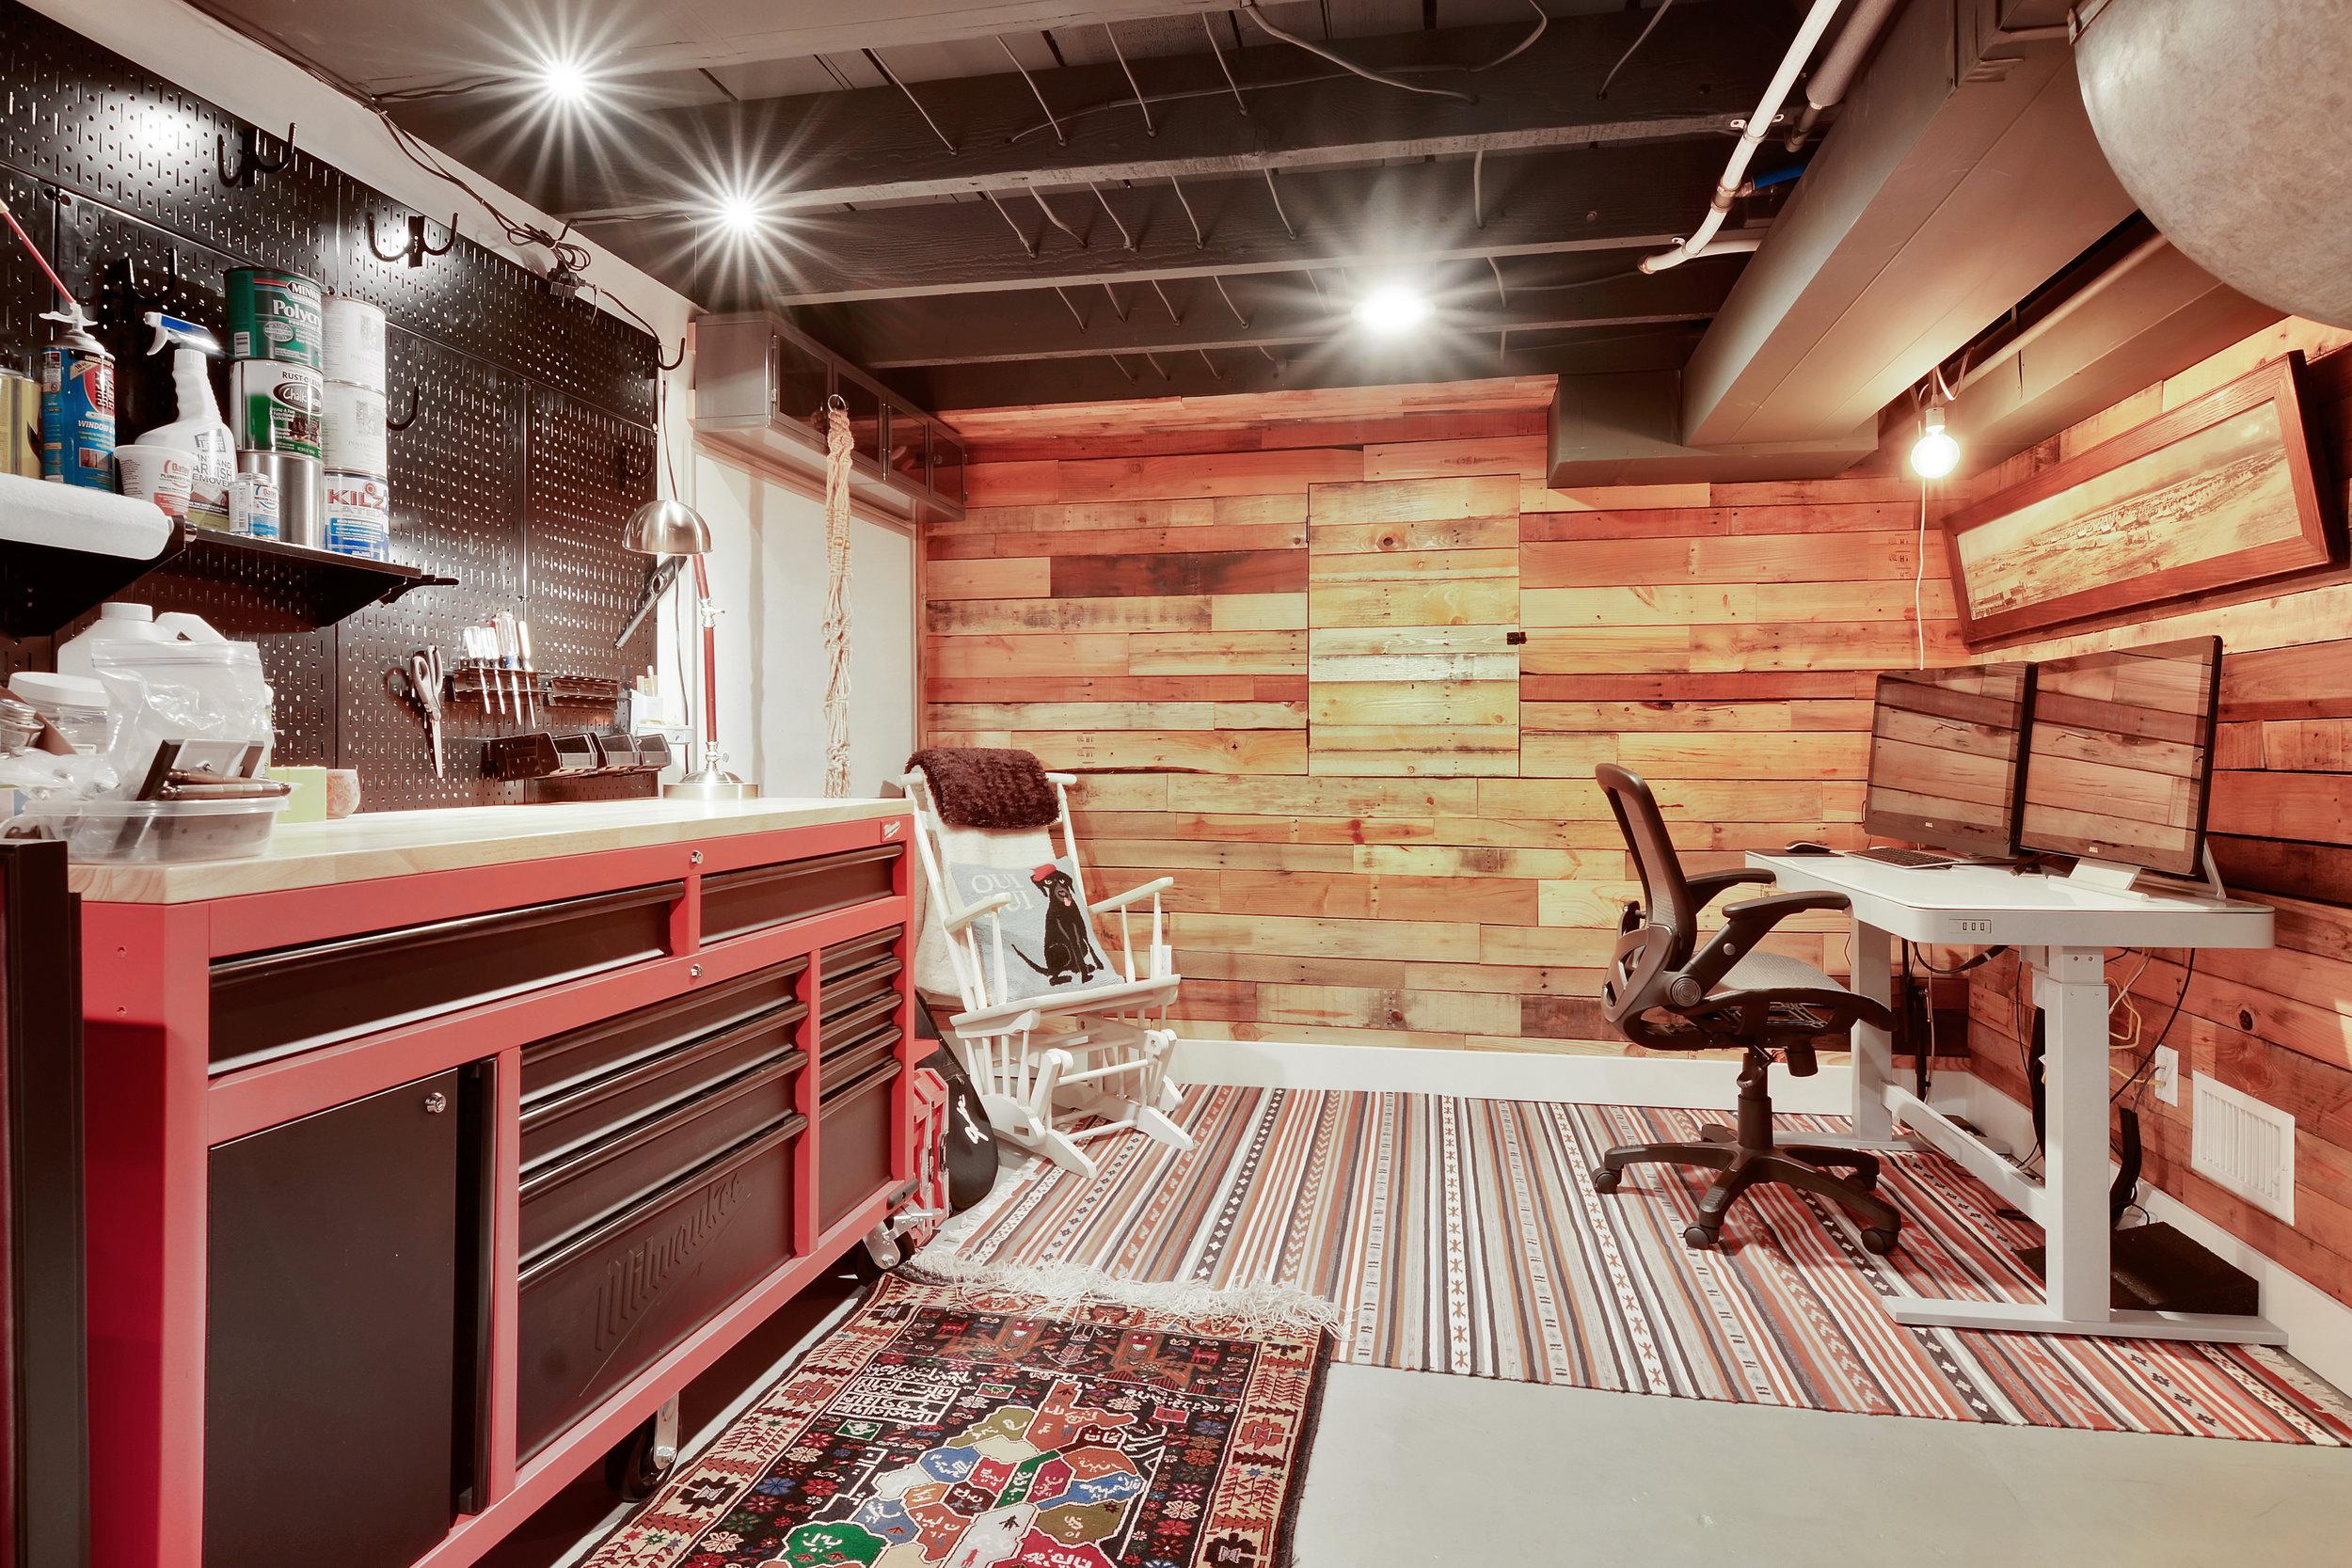 workshop in basement.jpg